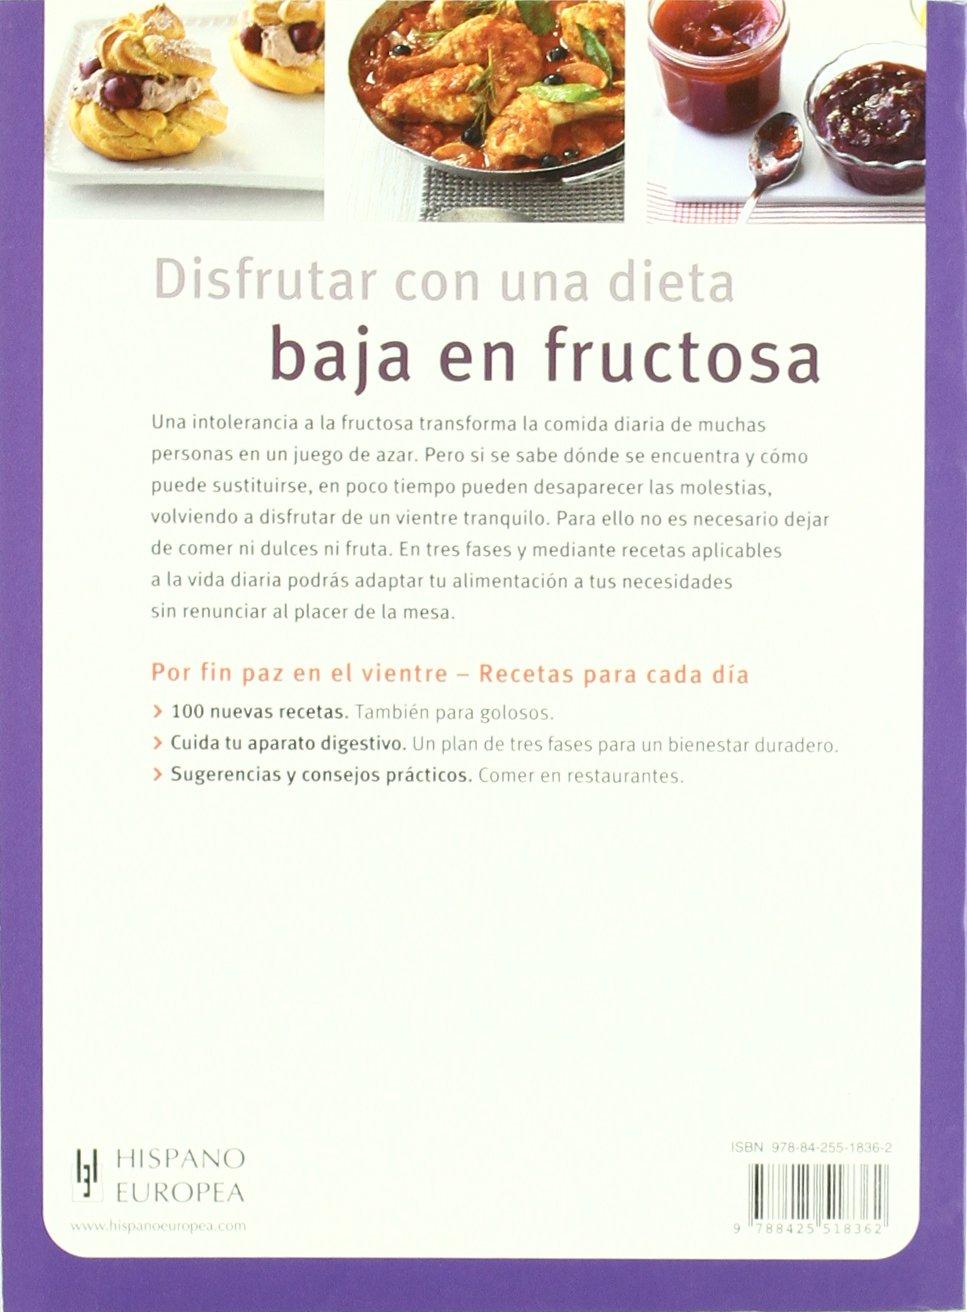 Dieta sin fructosa menu